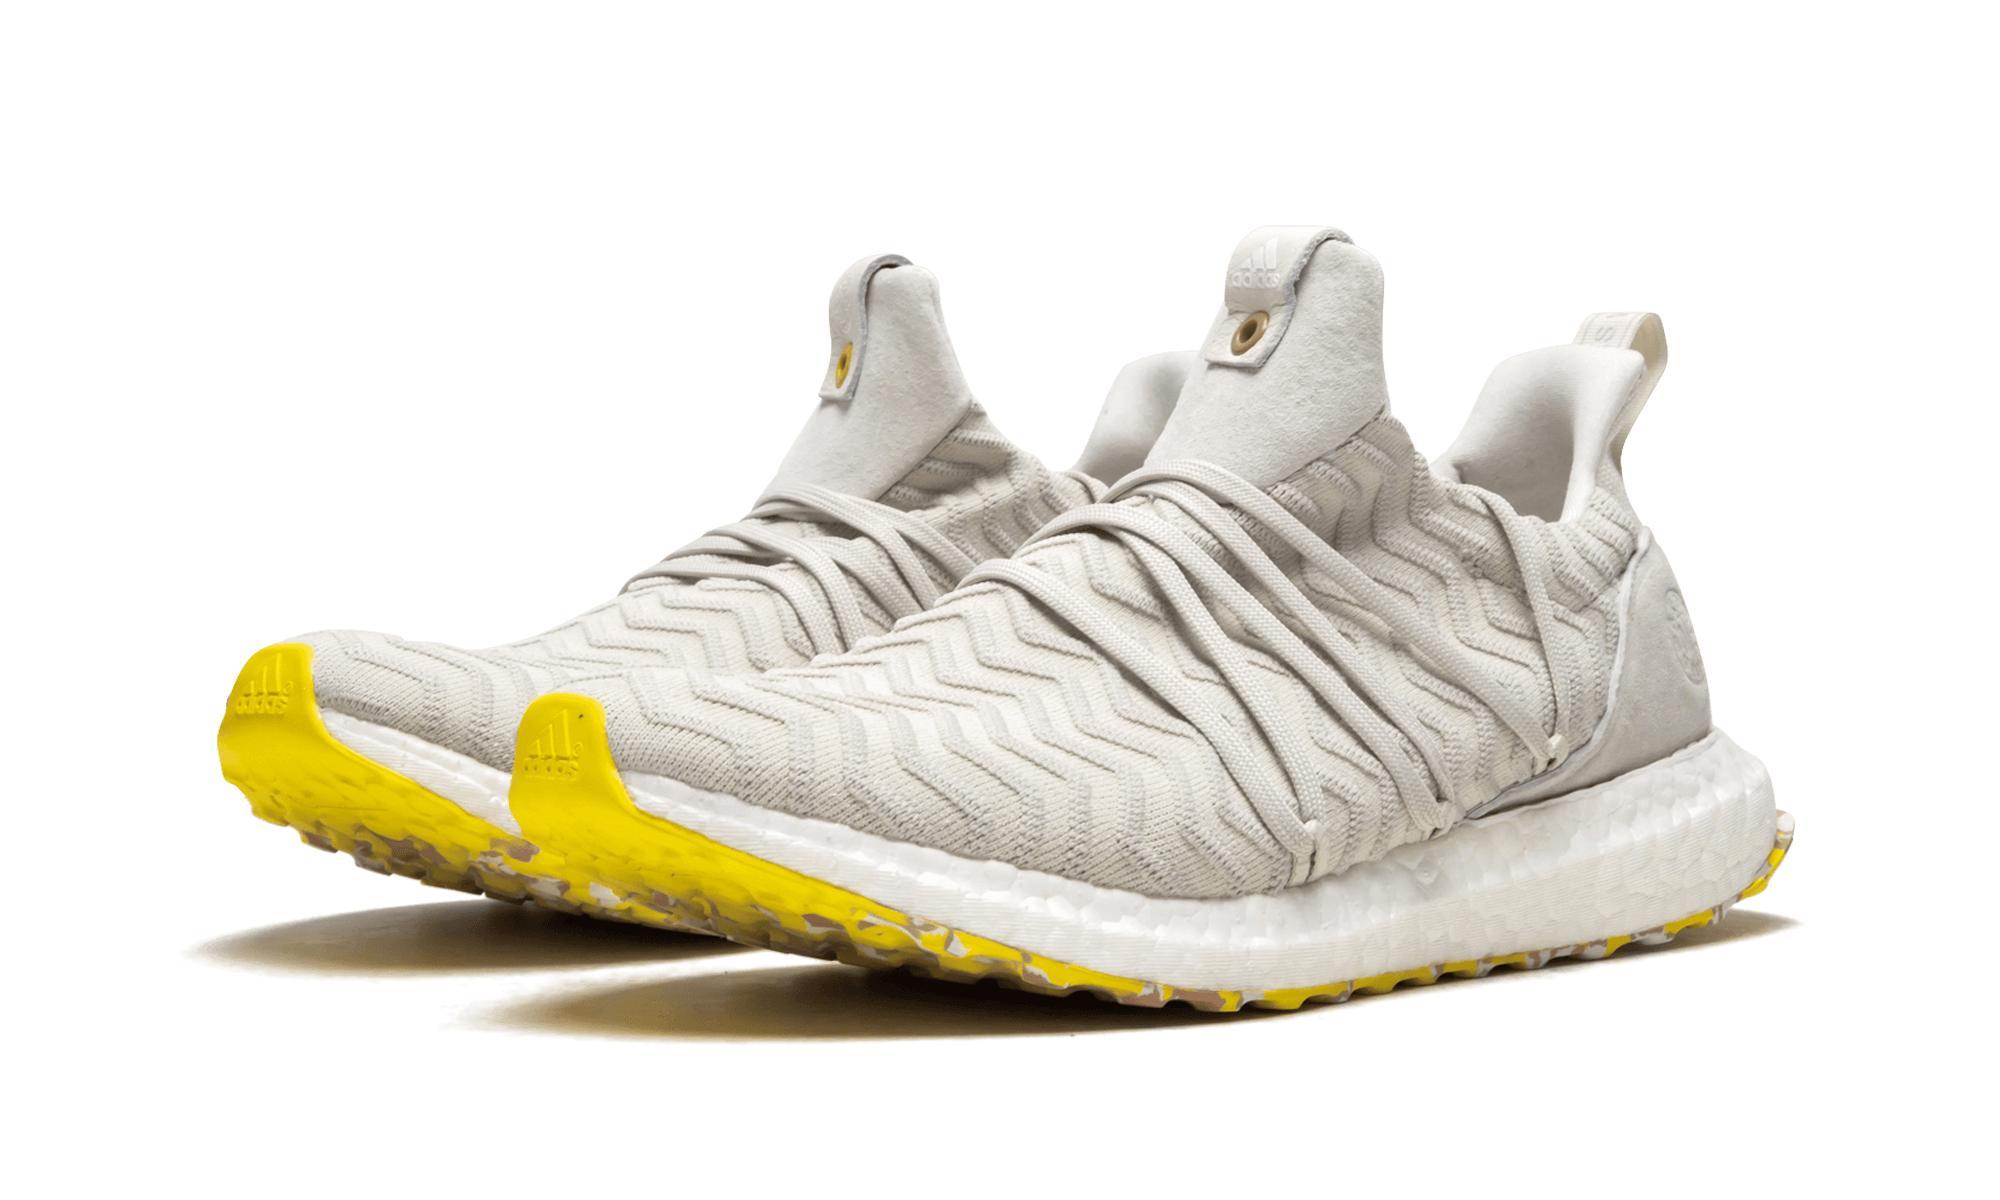 separation shoes 8d023 83a3d Adidas - Multicolor Ultraboost Akog for Men - Lyst. View fullscreen